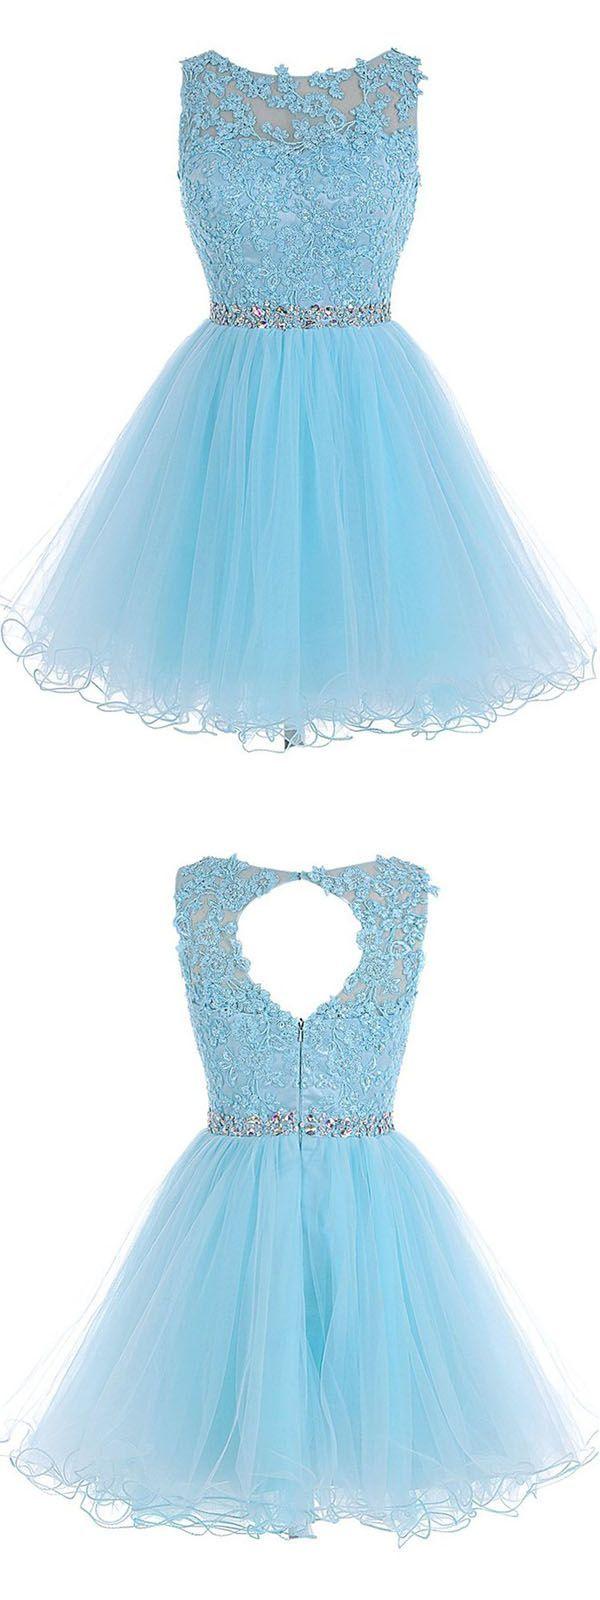 10 best Fall images on Pinterest   Feminine fashion, Party dresses ...